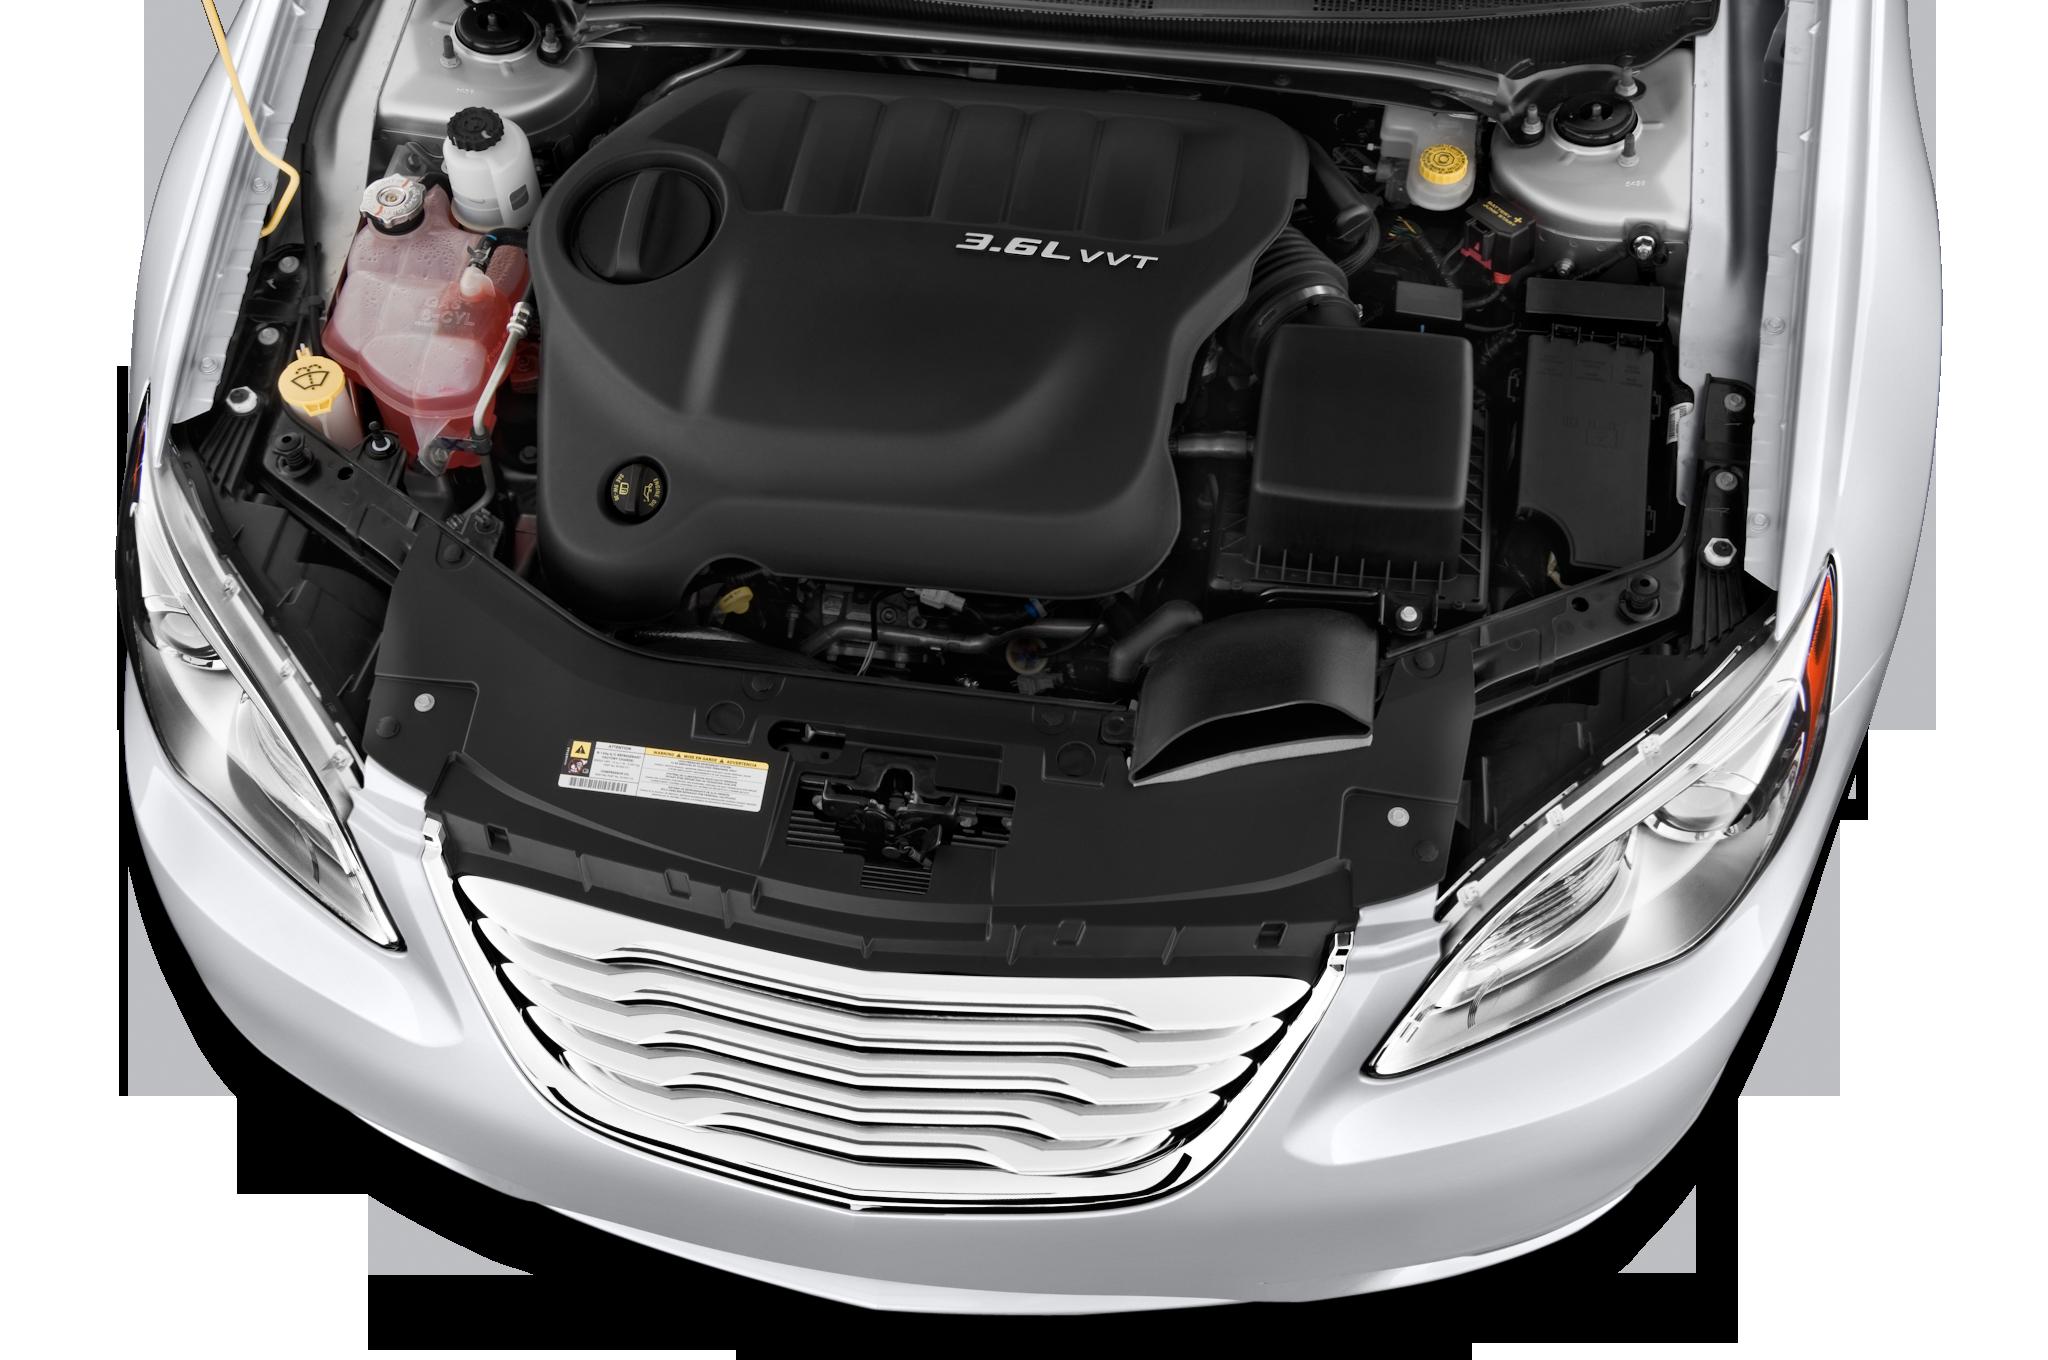 chrysler news sedan reviews price with amazing msrp ratings